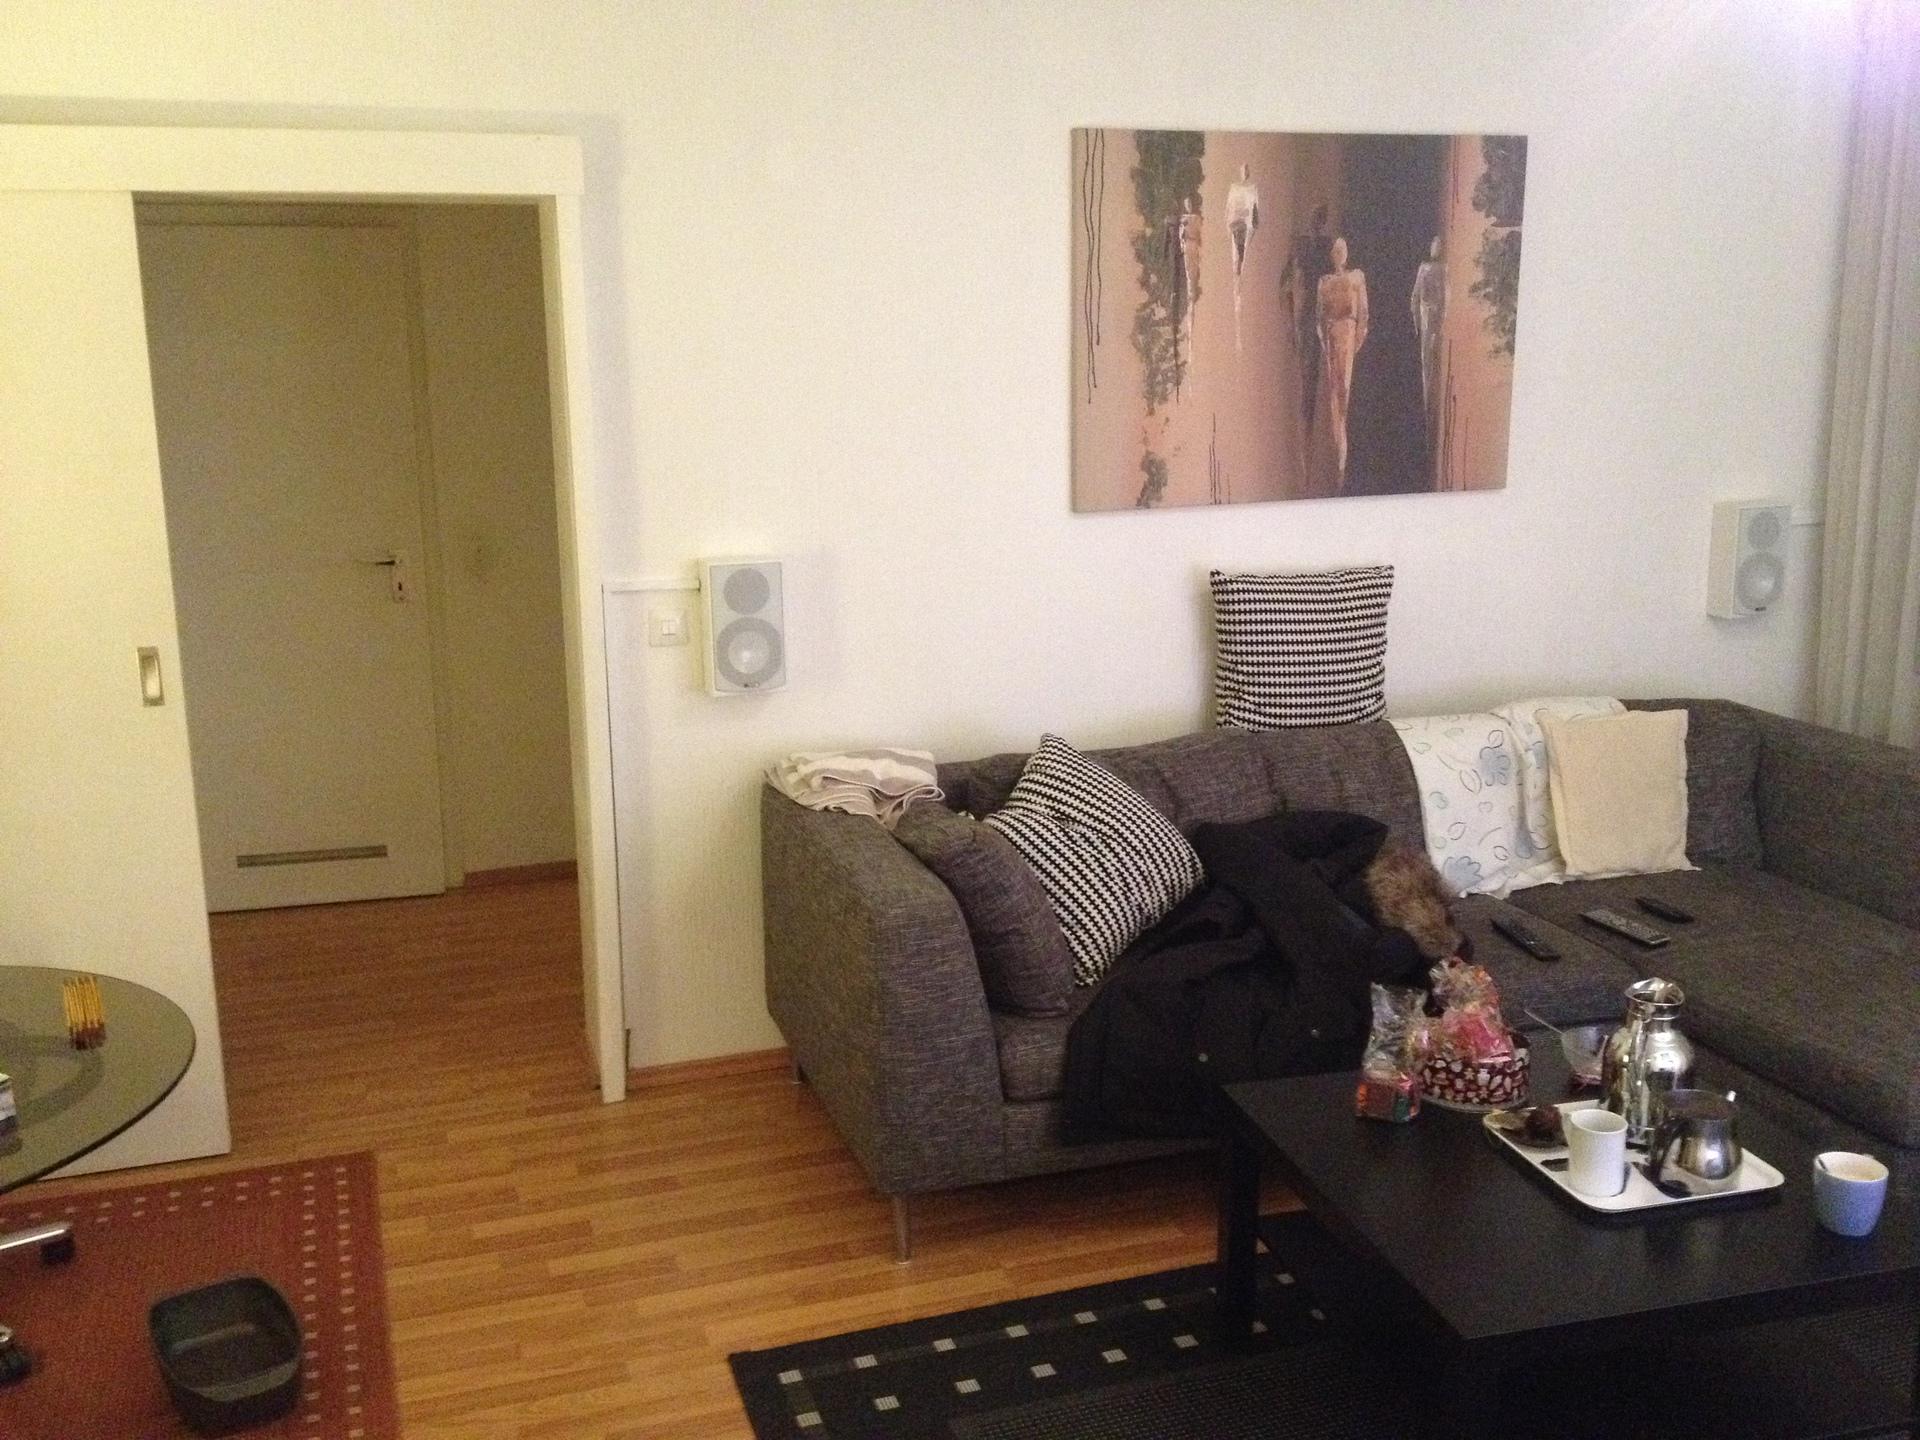 foto 3 heimkino lautsprecher surround hifi bildergalerie. Black Bedroom Furniture Sets. Home Design Ideas